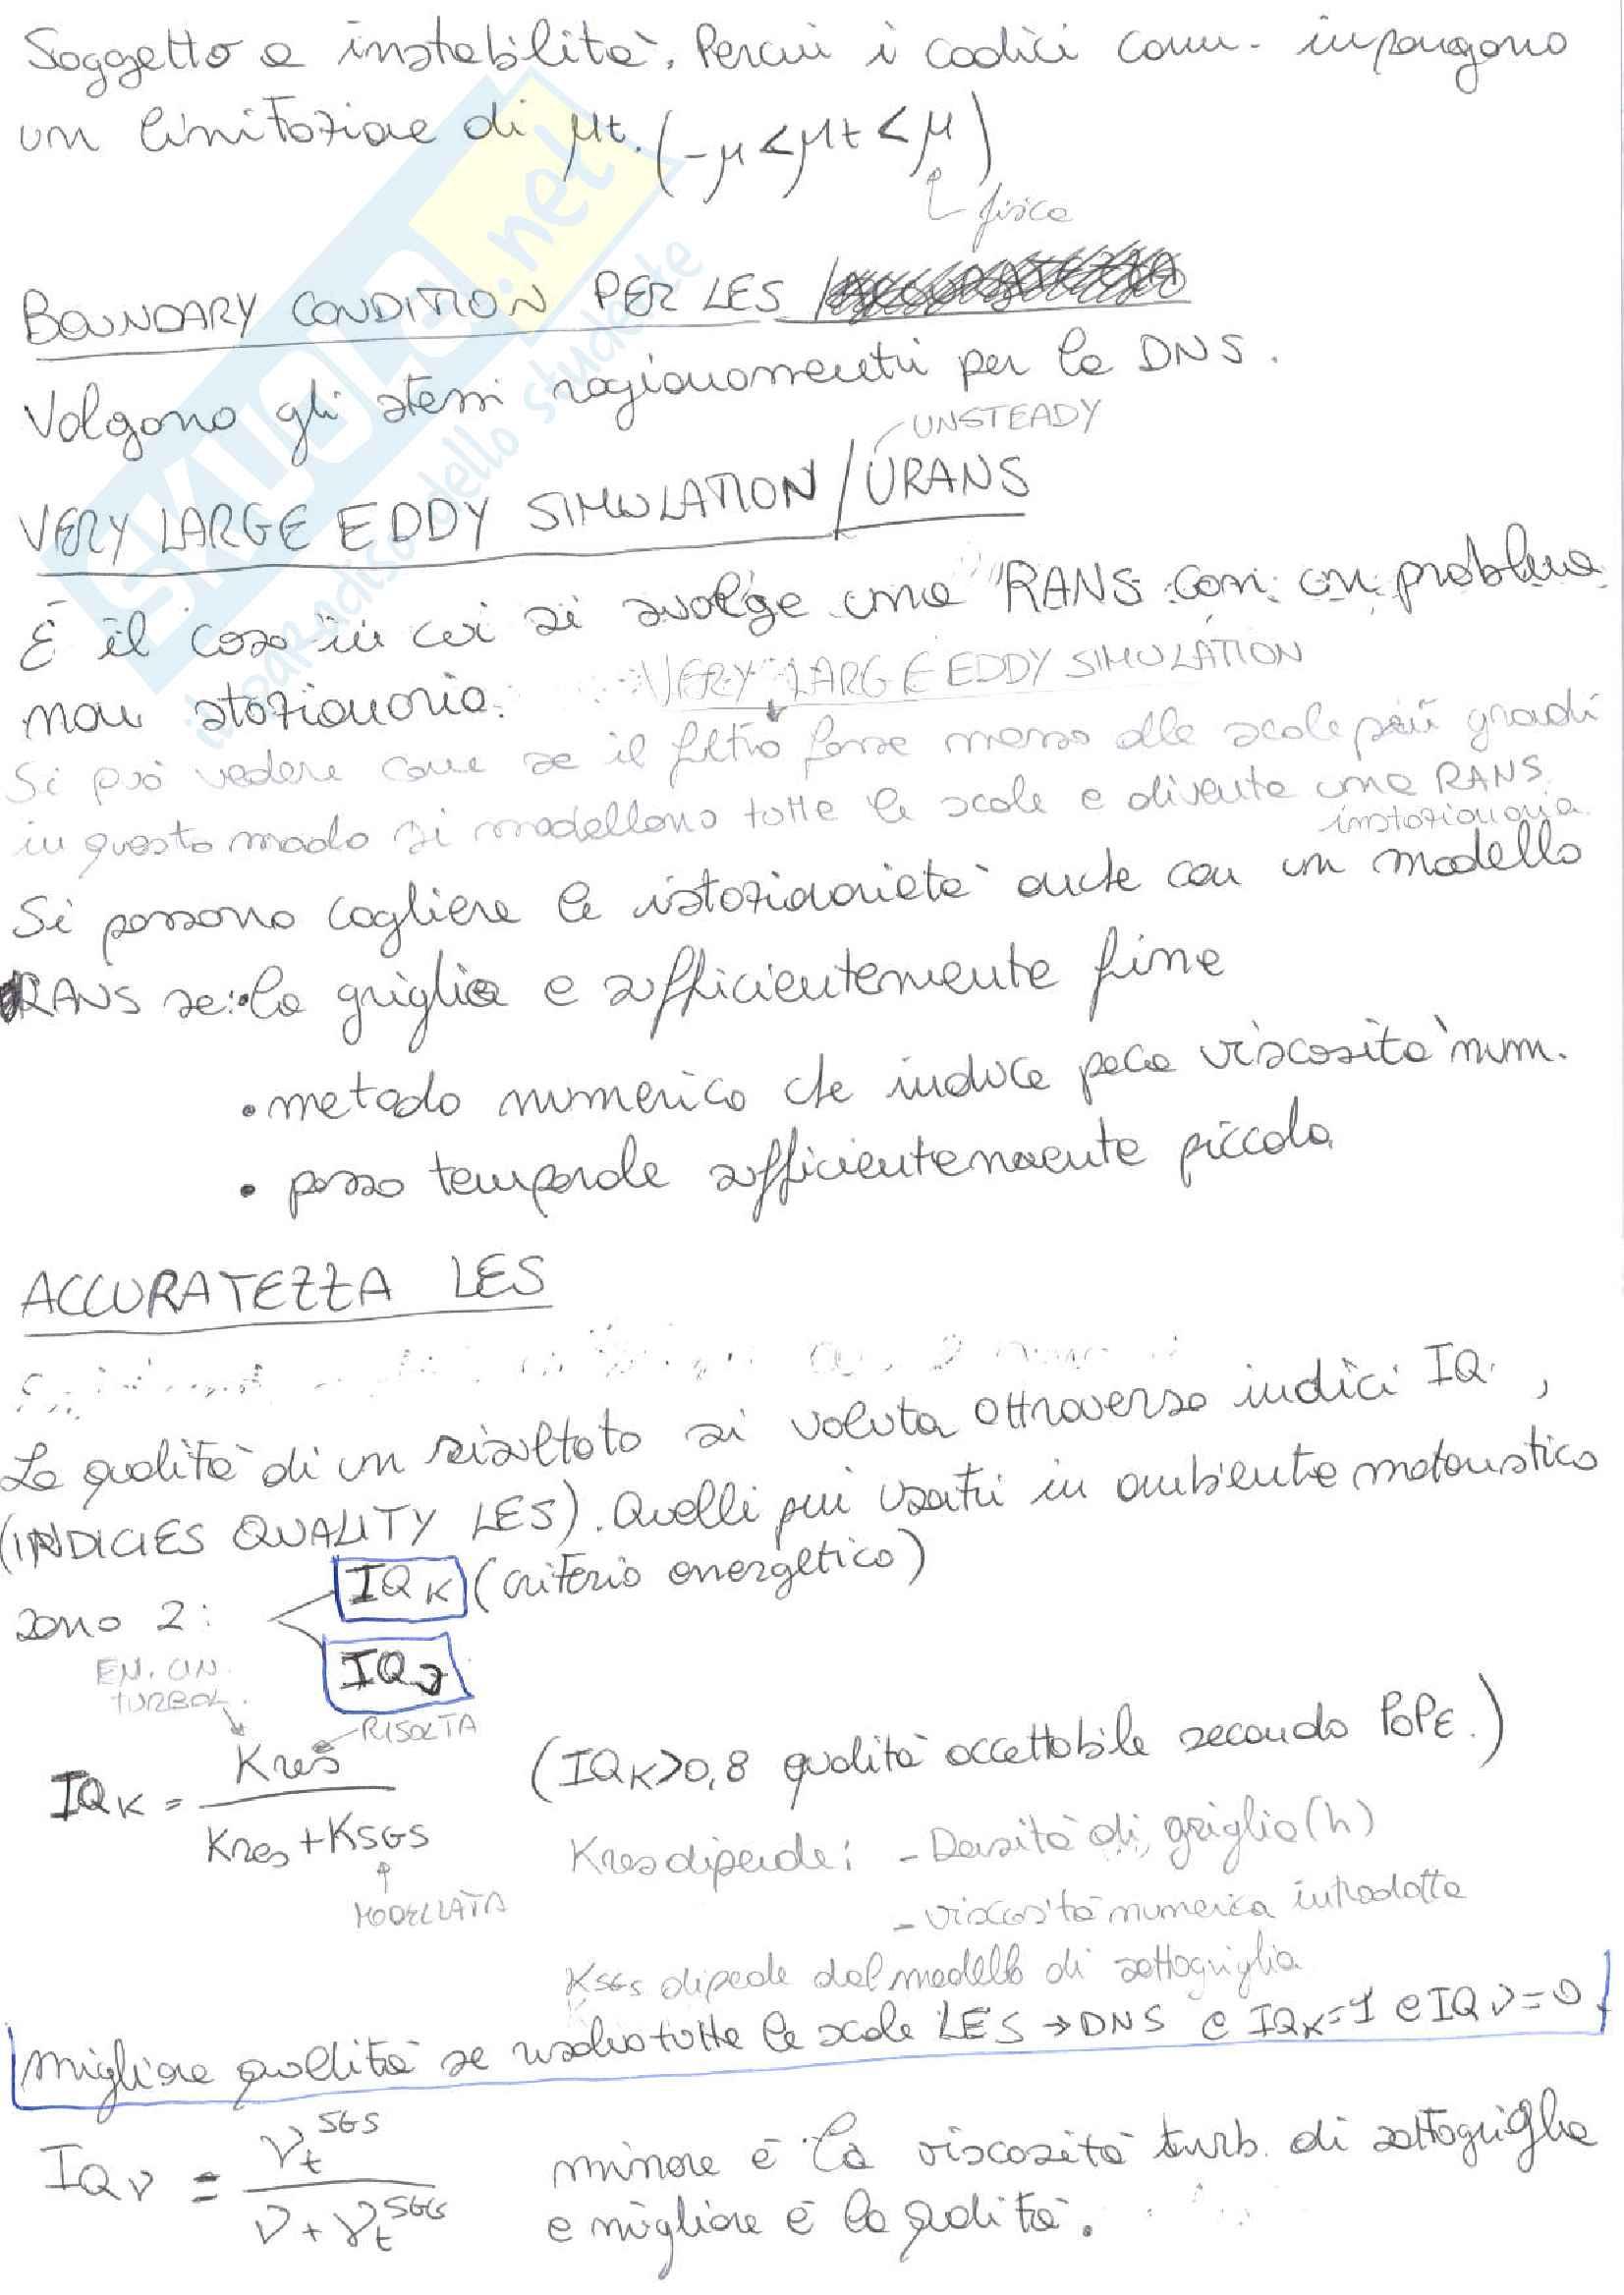 Simulazione Fluidodinamica motori Pag. 36